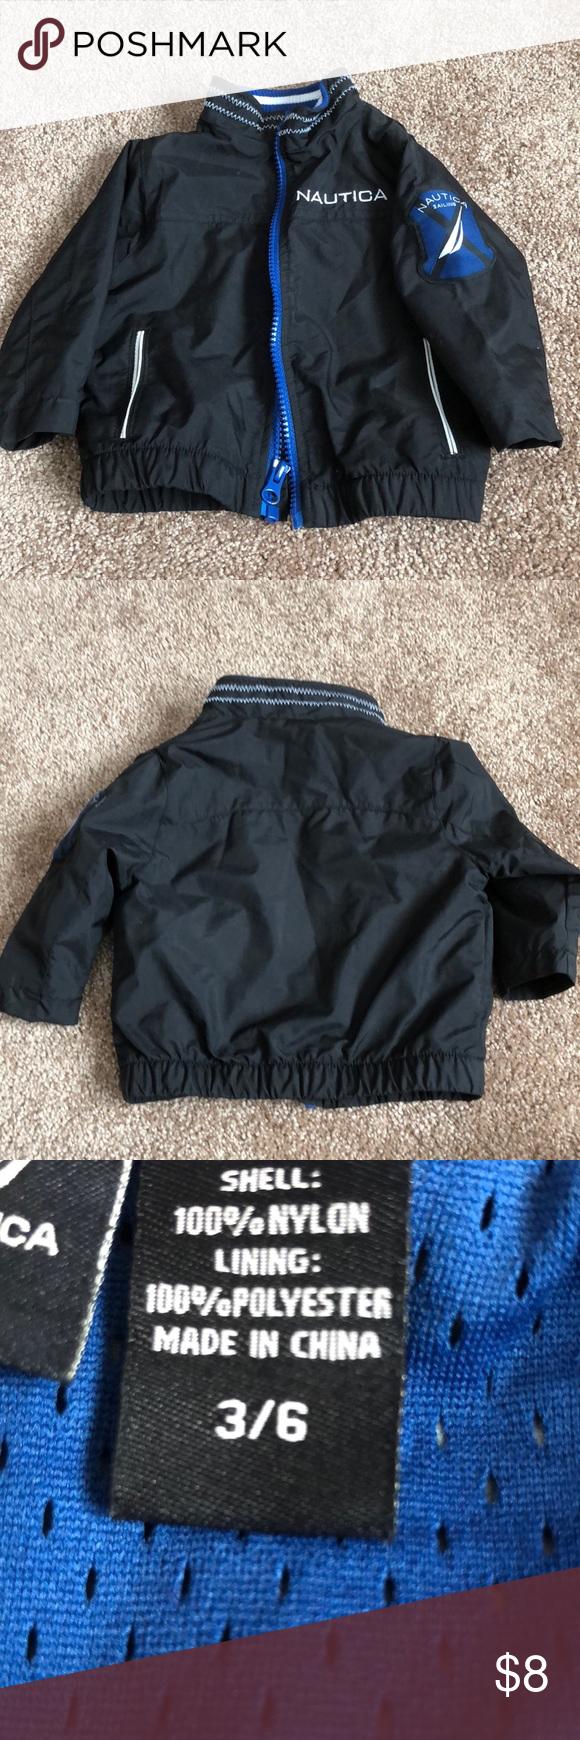 3 6 Month Boy Light Weight Jacket Jackets Baby Jacket Kids Jacket [ 1740 x 580 Pixel ]